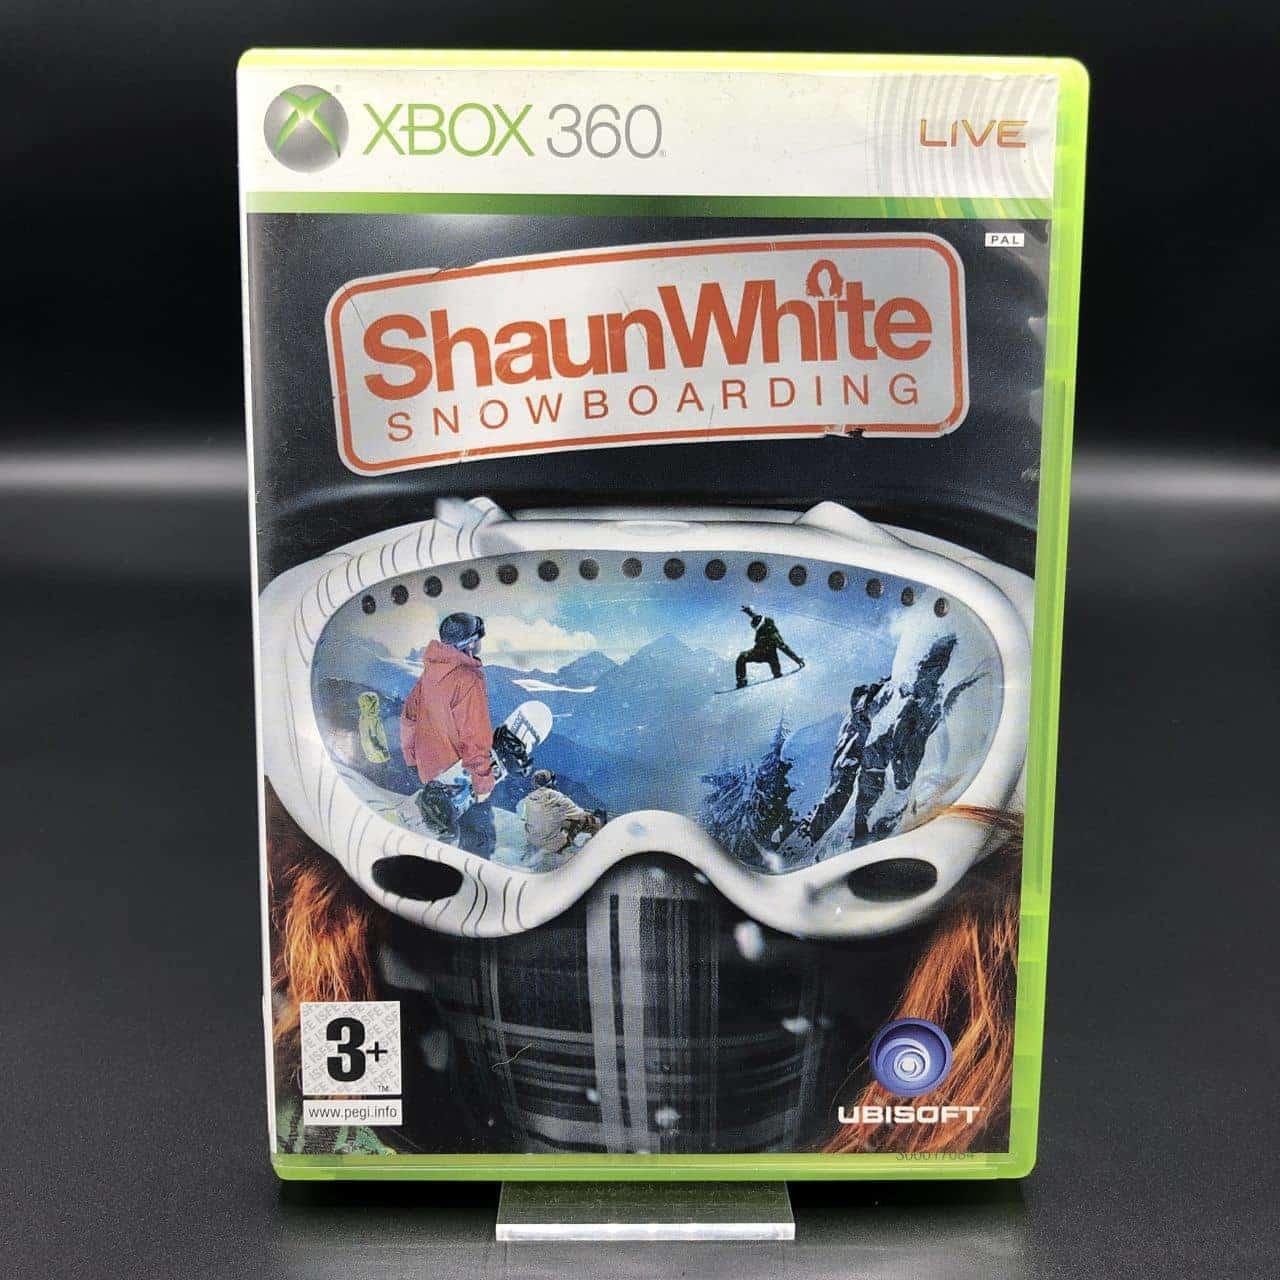 Shaun White Snowboarding (Komplett) (Sehr gut) Xbox 360